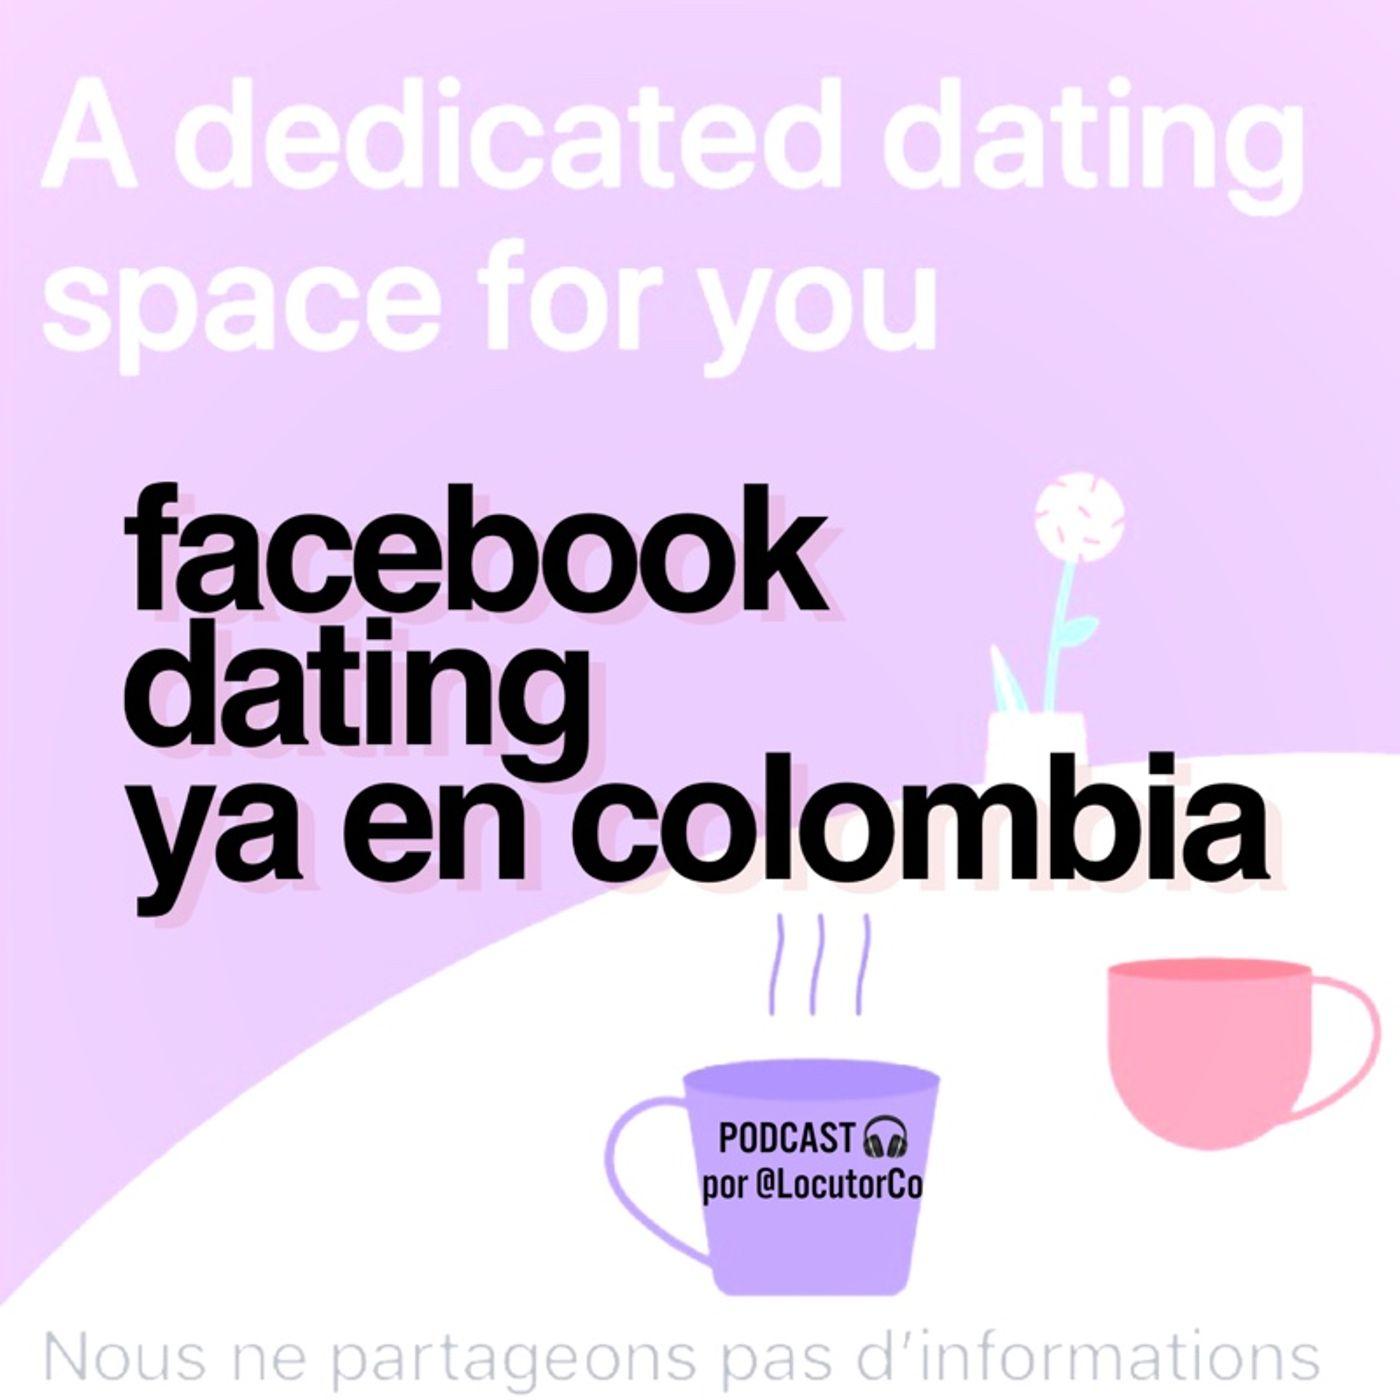 Facebook Dating ya en Colombia